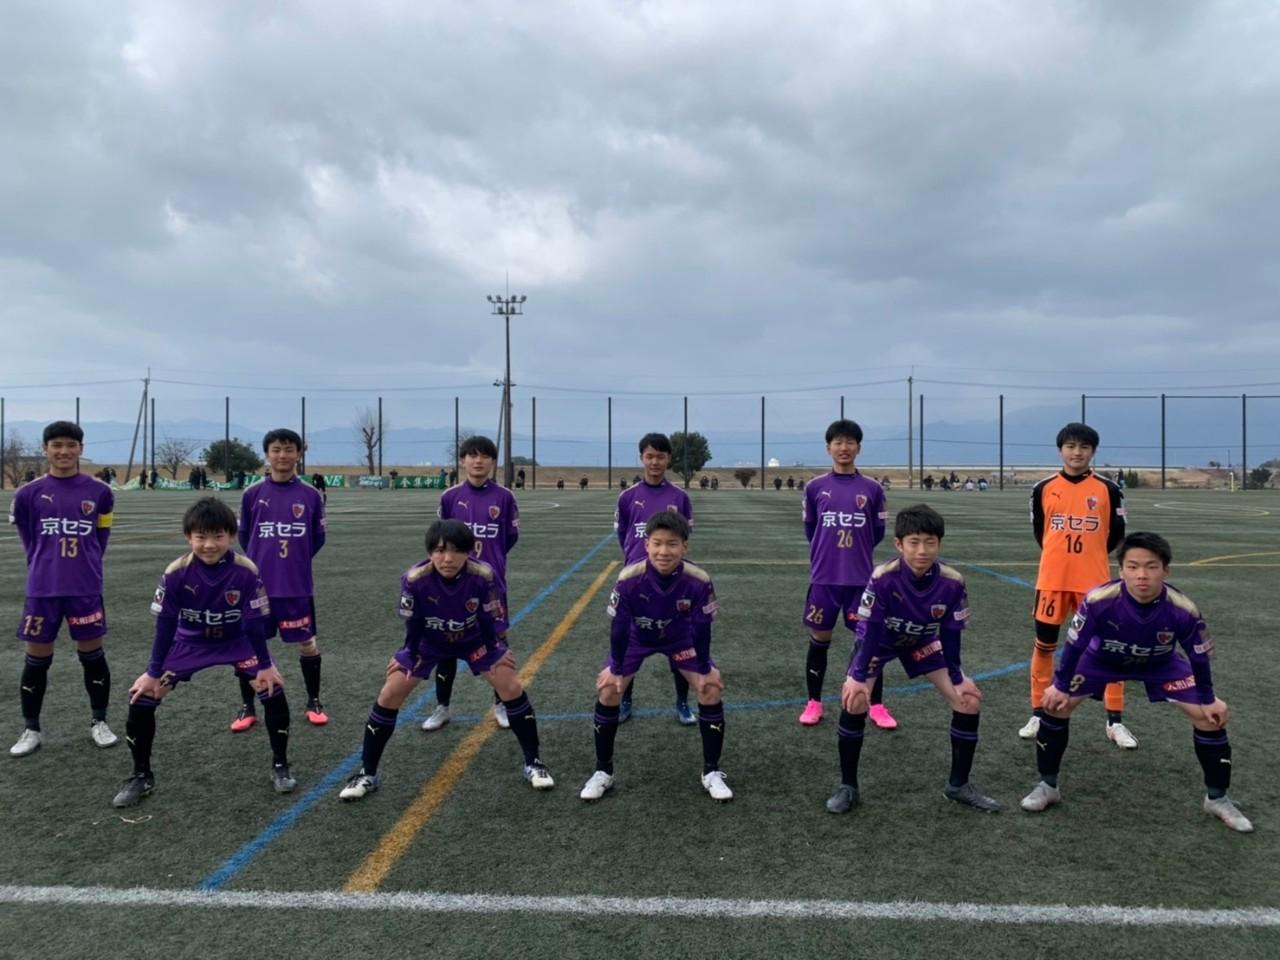 【U-14】高円宮杯JFA U-15サッカーリーグ滋賀2021 TOPリーグ第6節